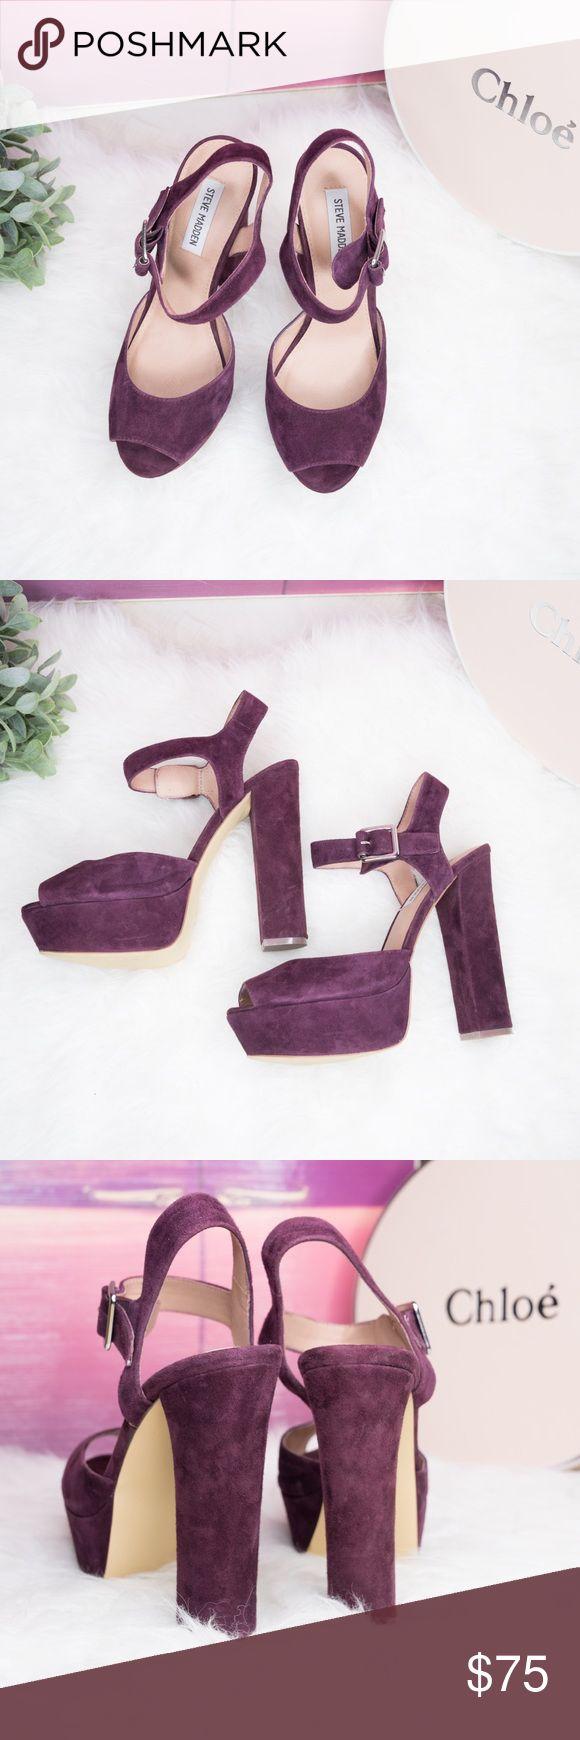 Final sale! Steve Madden Purple Heels Size 8.5 Steve Madden Jillyy Purple Platform Heeled Sandals. Size 8.5. Leather upper. These heel sandals are in brand new condition. Steve Madden Shoes Heels